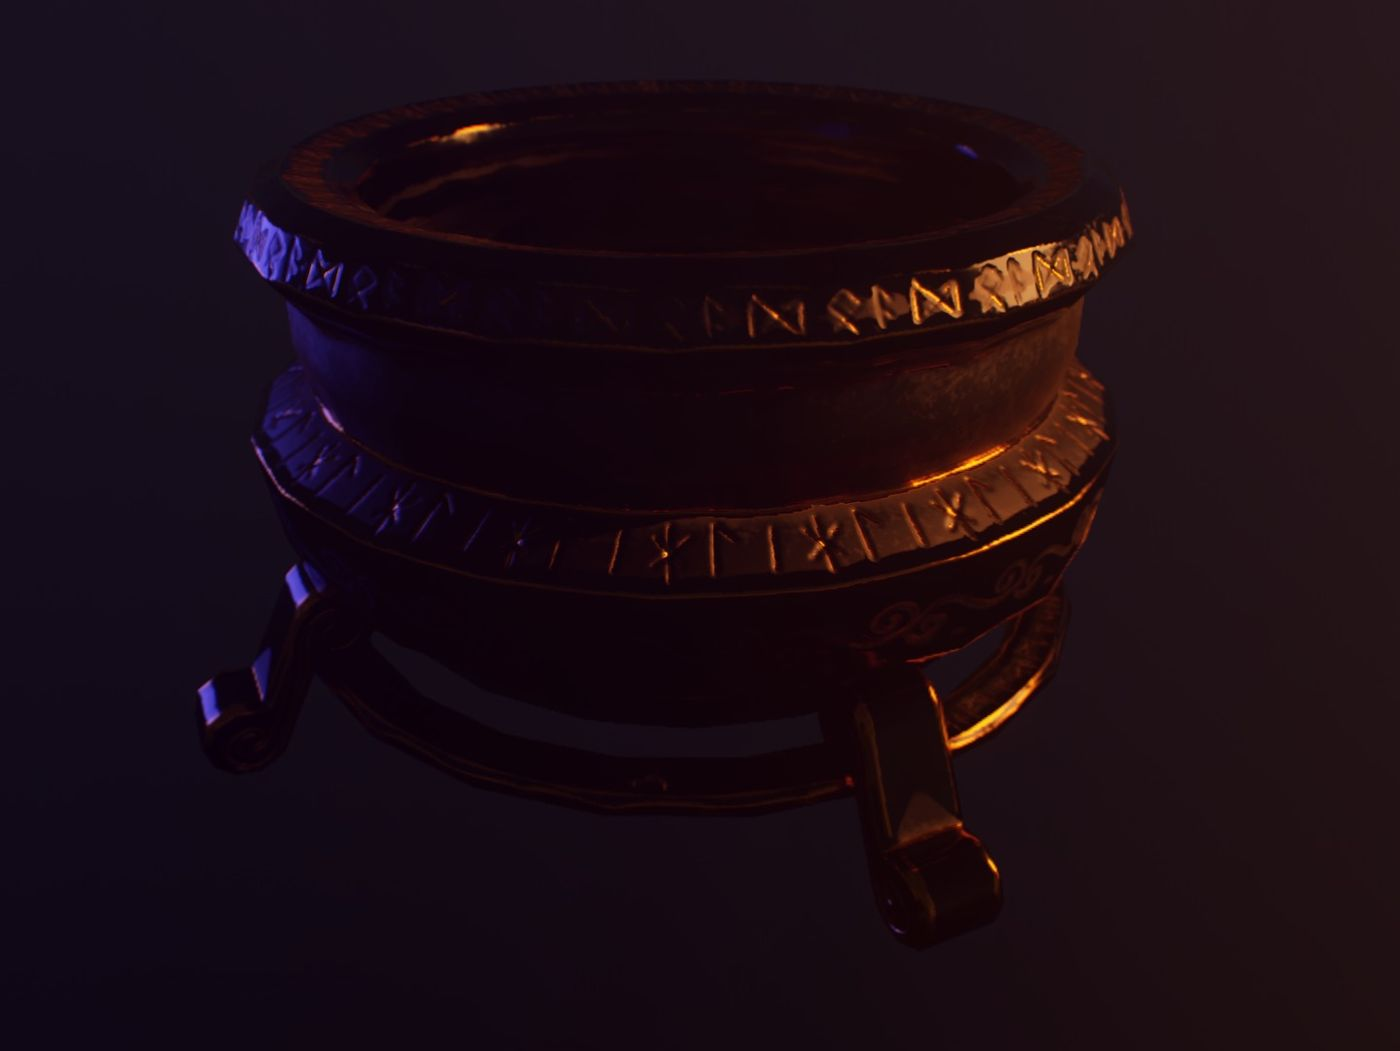 Celtic Cauldron